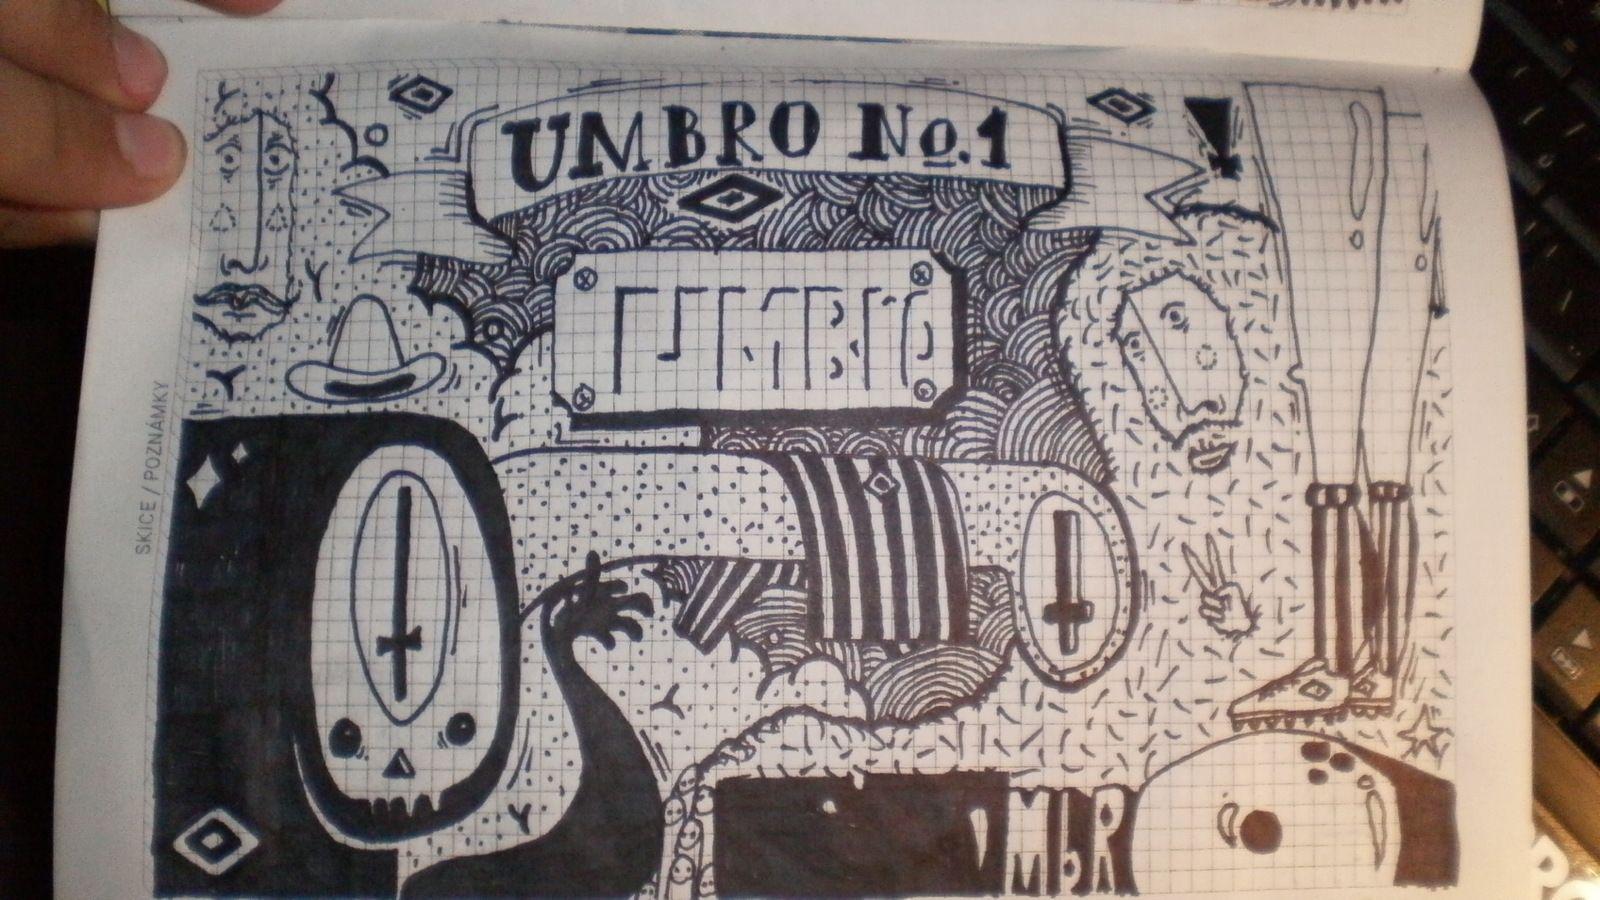 46fb1e692aed9 Umbro x Foot Locker competition entry by Daniel Frniak